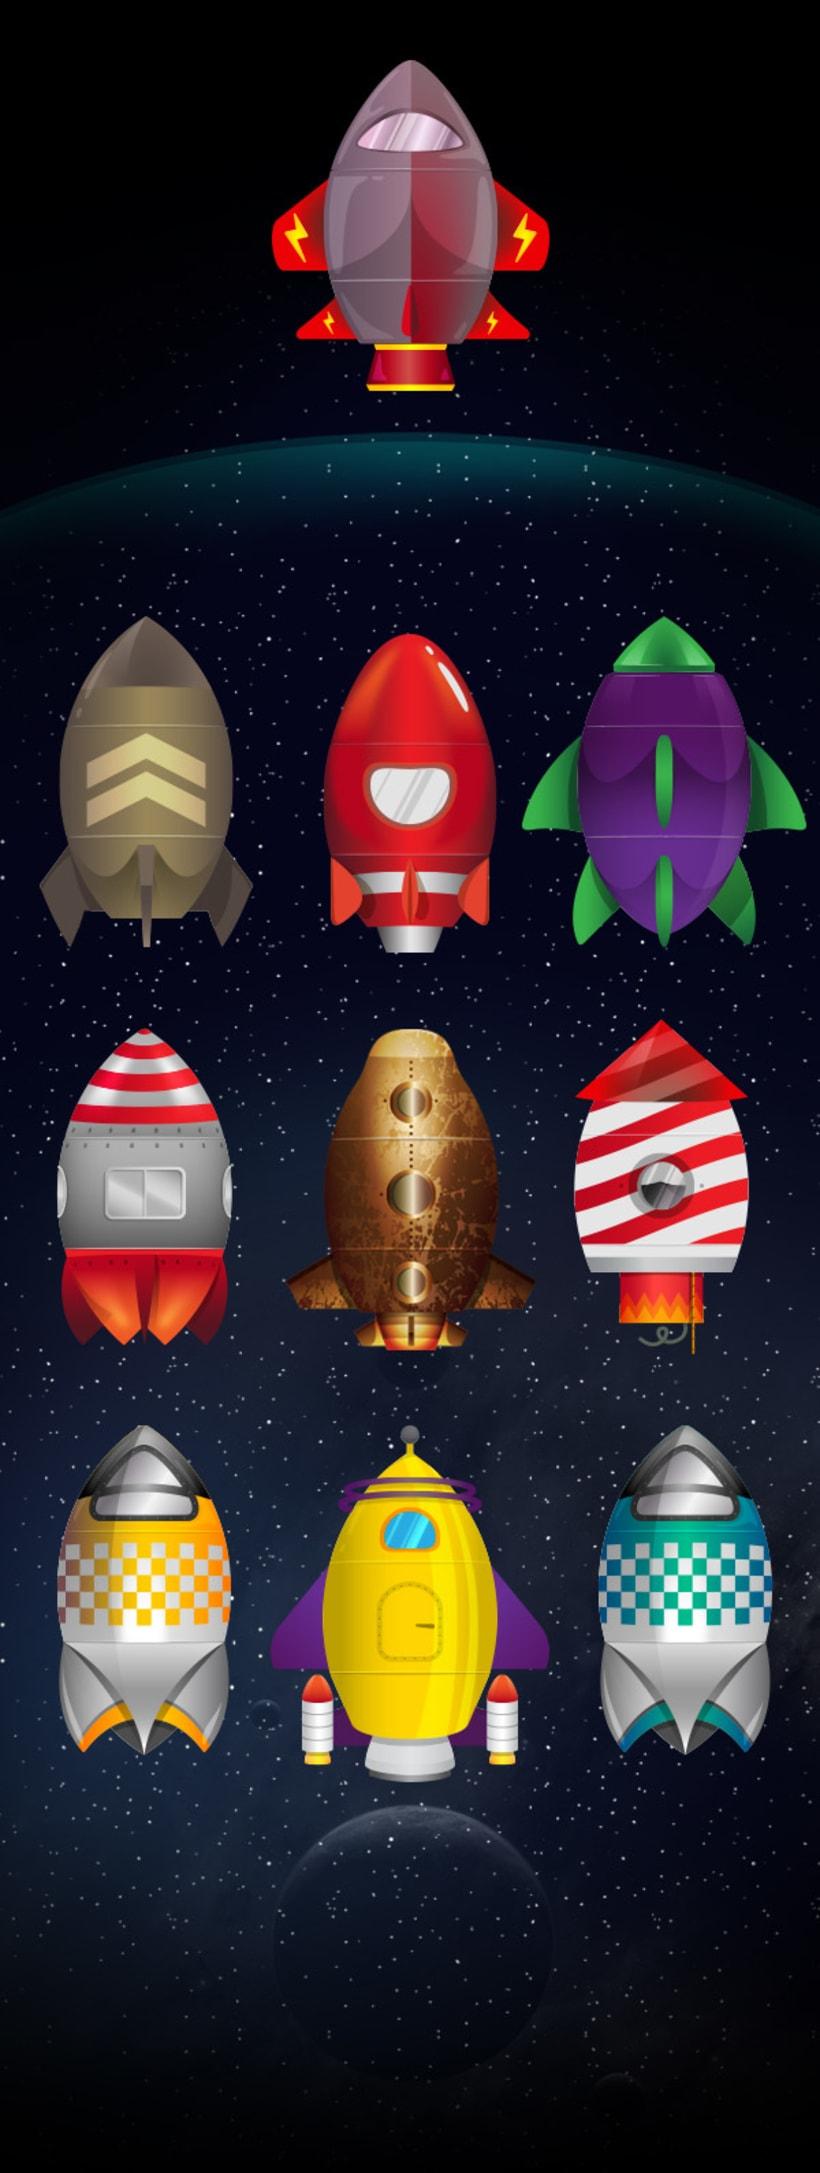 Lil'Rocket Game (Work in progress). 6